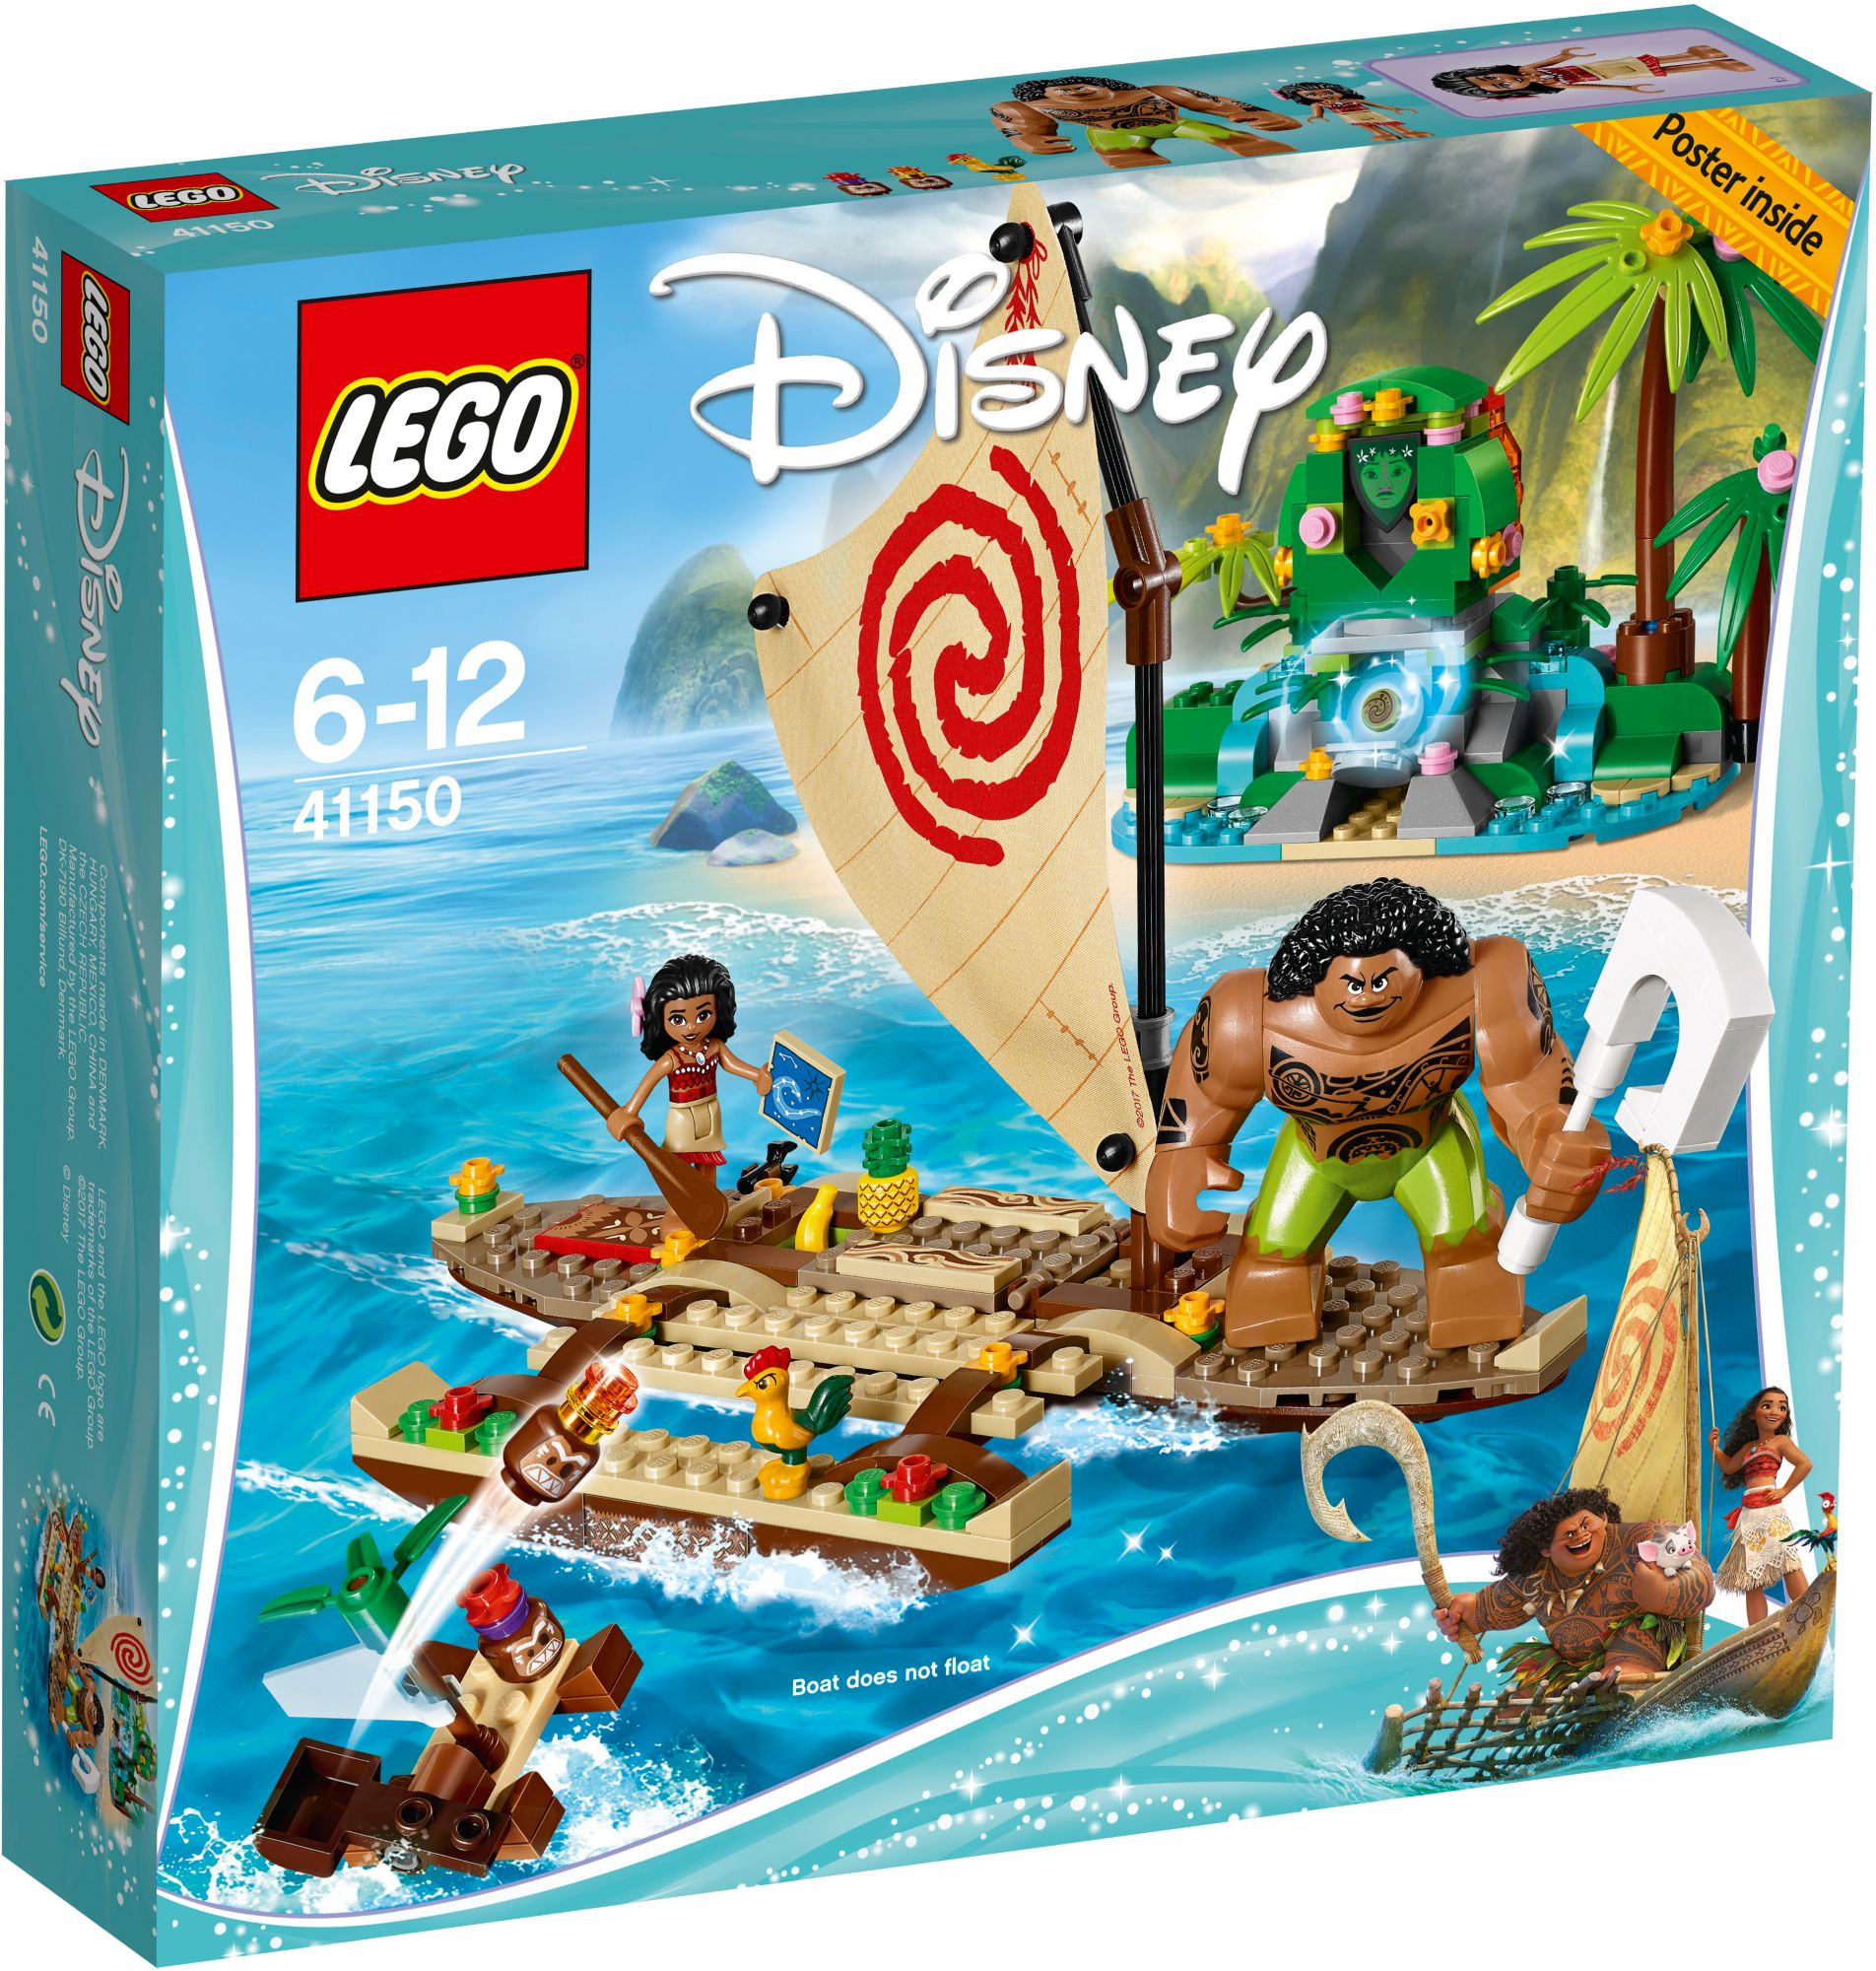 LEGO® 41150 Disney Princess Vaiana auf hoher See, Konstruktionsspielzeug